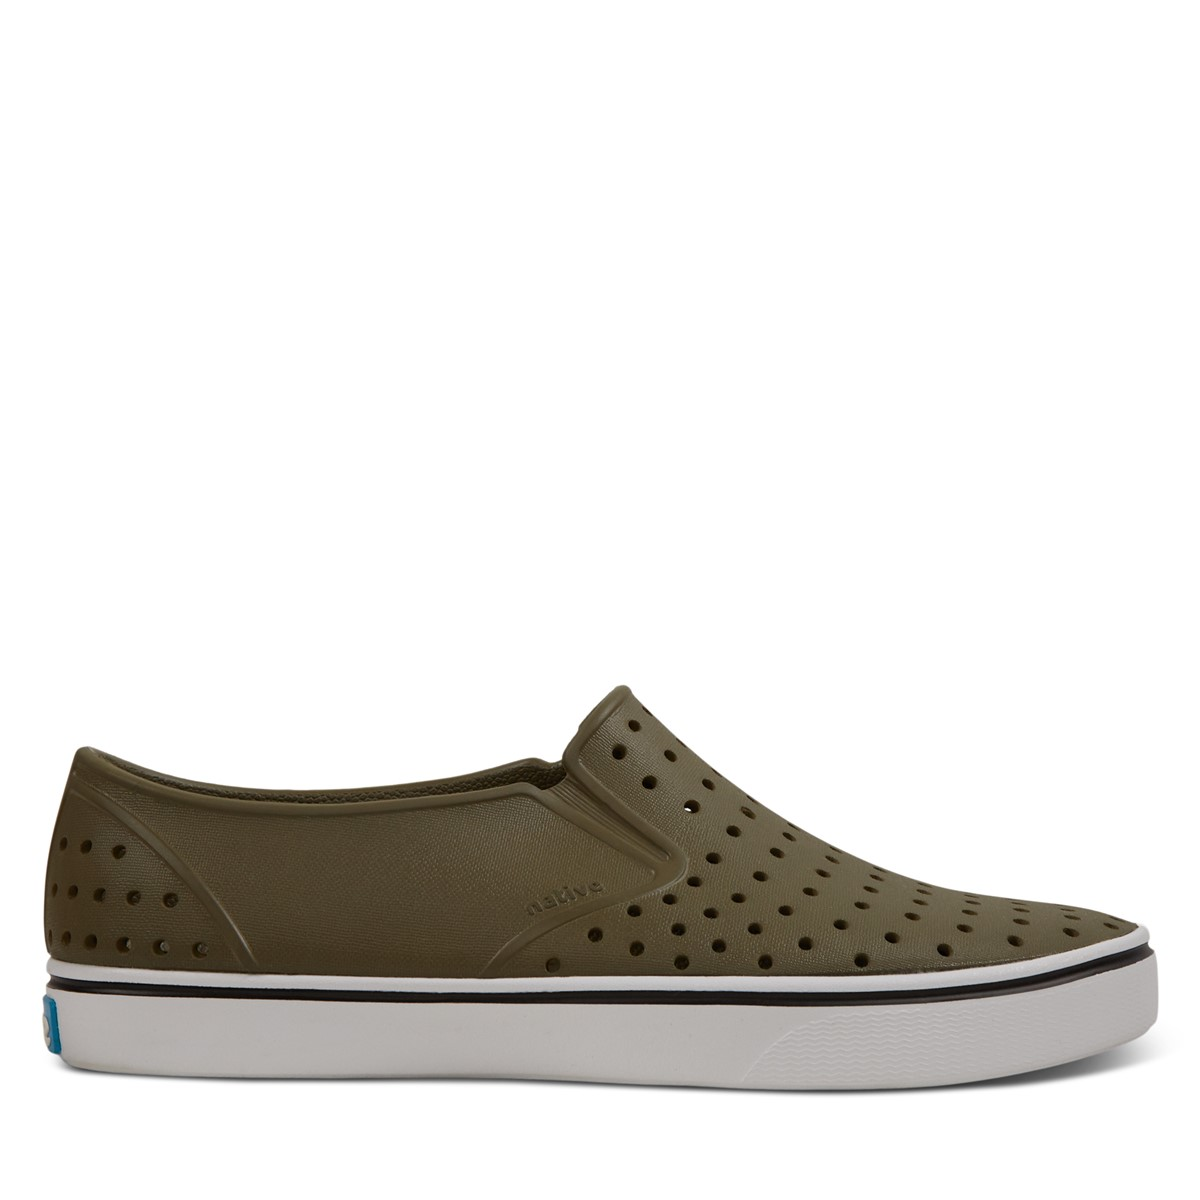 Men's Miles Slip-On Shoes in Olive Green